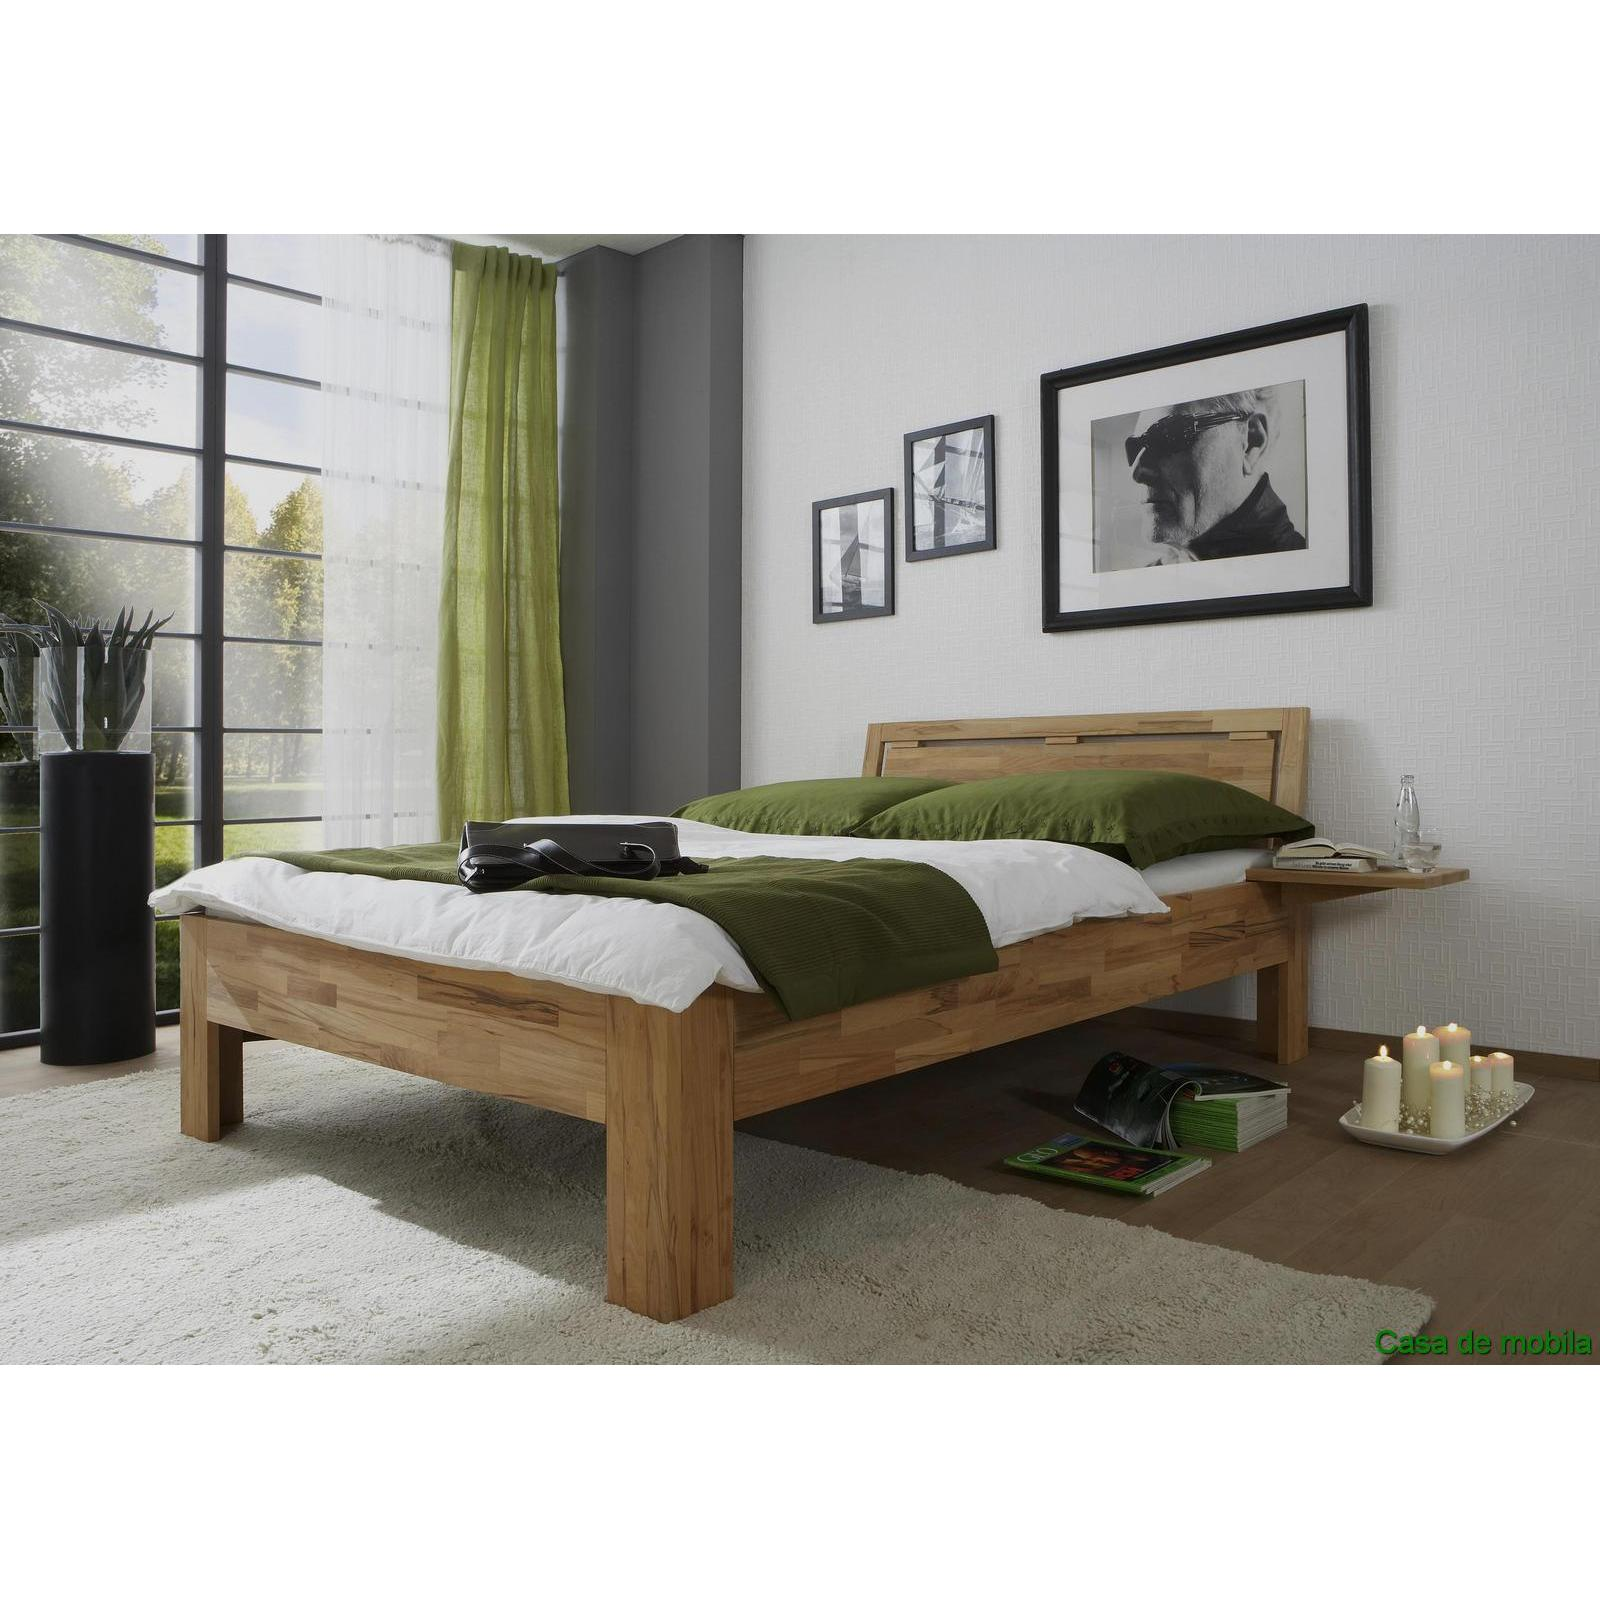 echtholz bett kernbuche massiv ge lt 100x200 caro mit. Black Bedroom Furniture Sets. Home Design Ideas